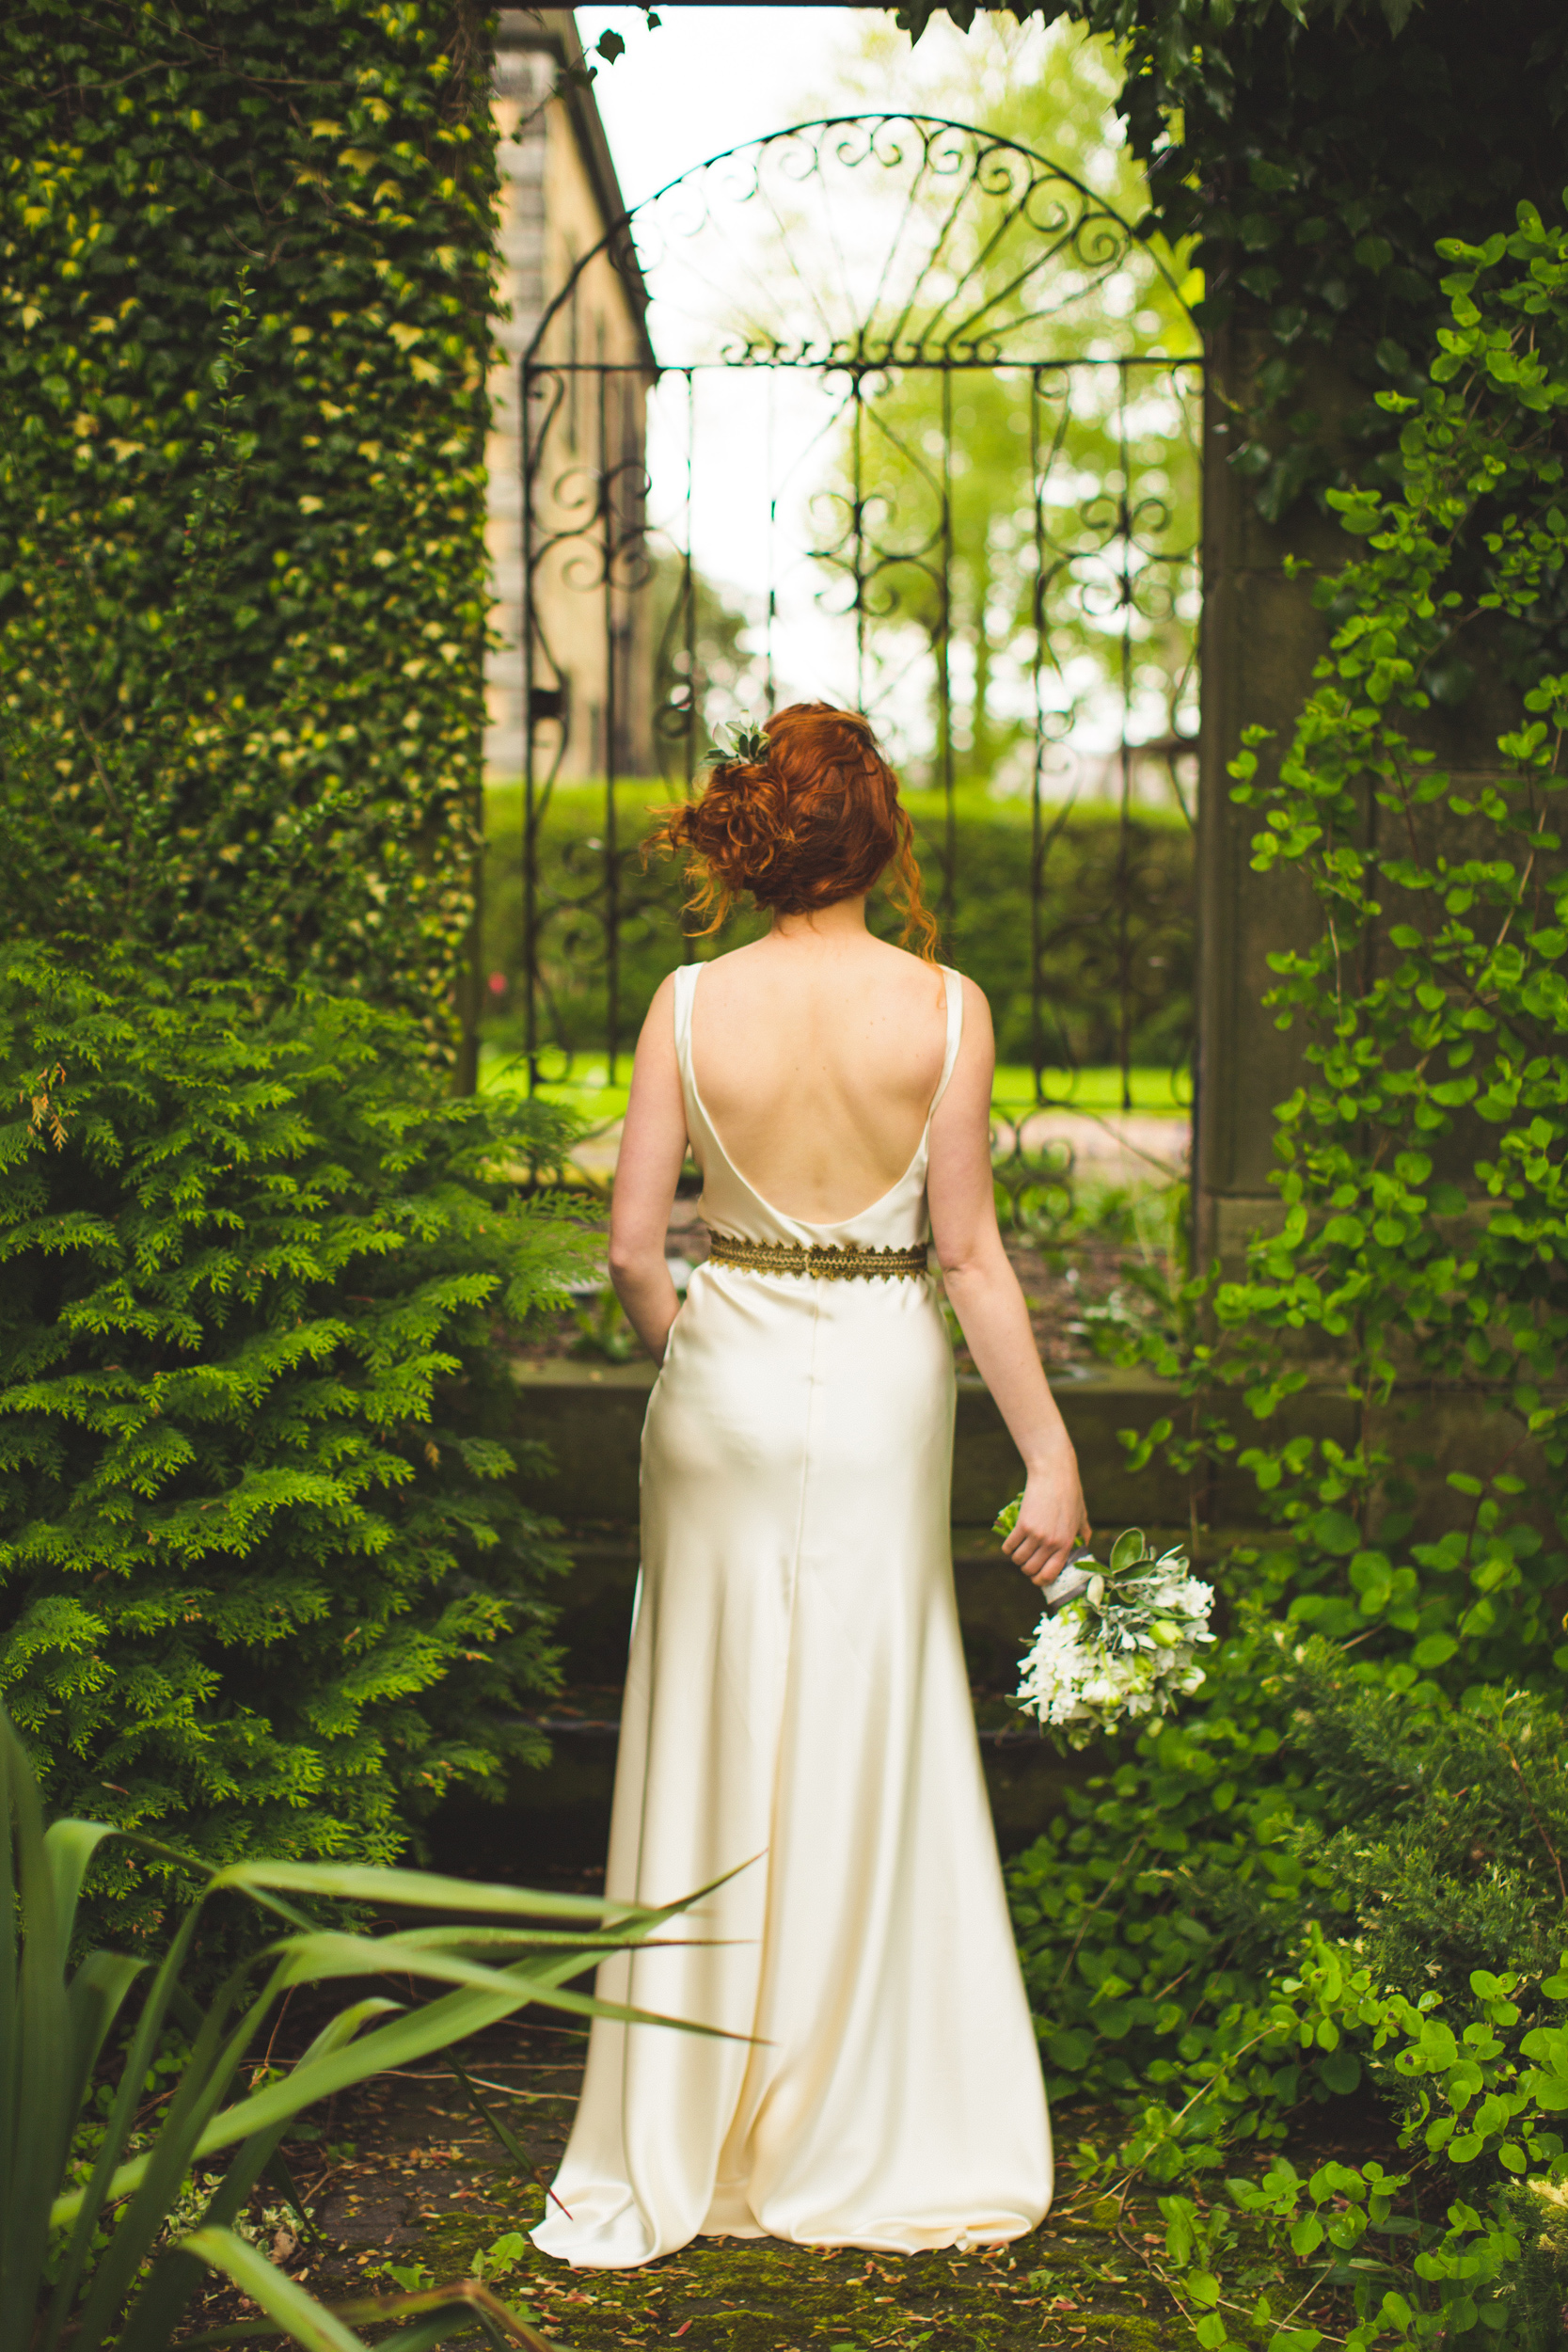 kate-beaumont-vintage-inspired-bridal-wedding-dresses-Sheffield-S6-13.jpg